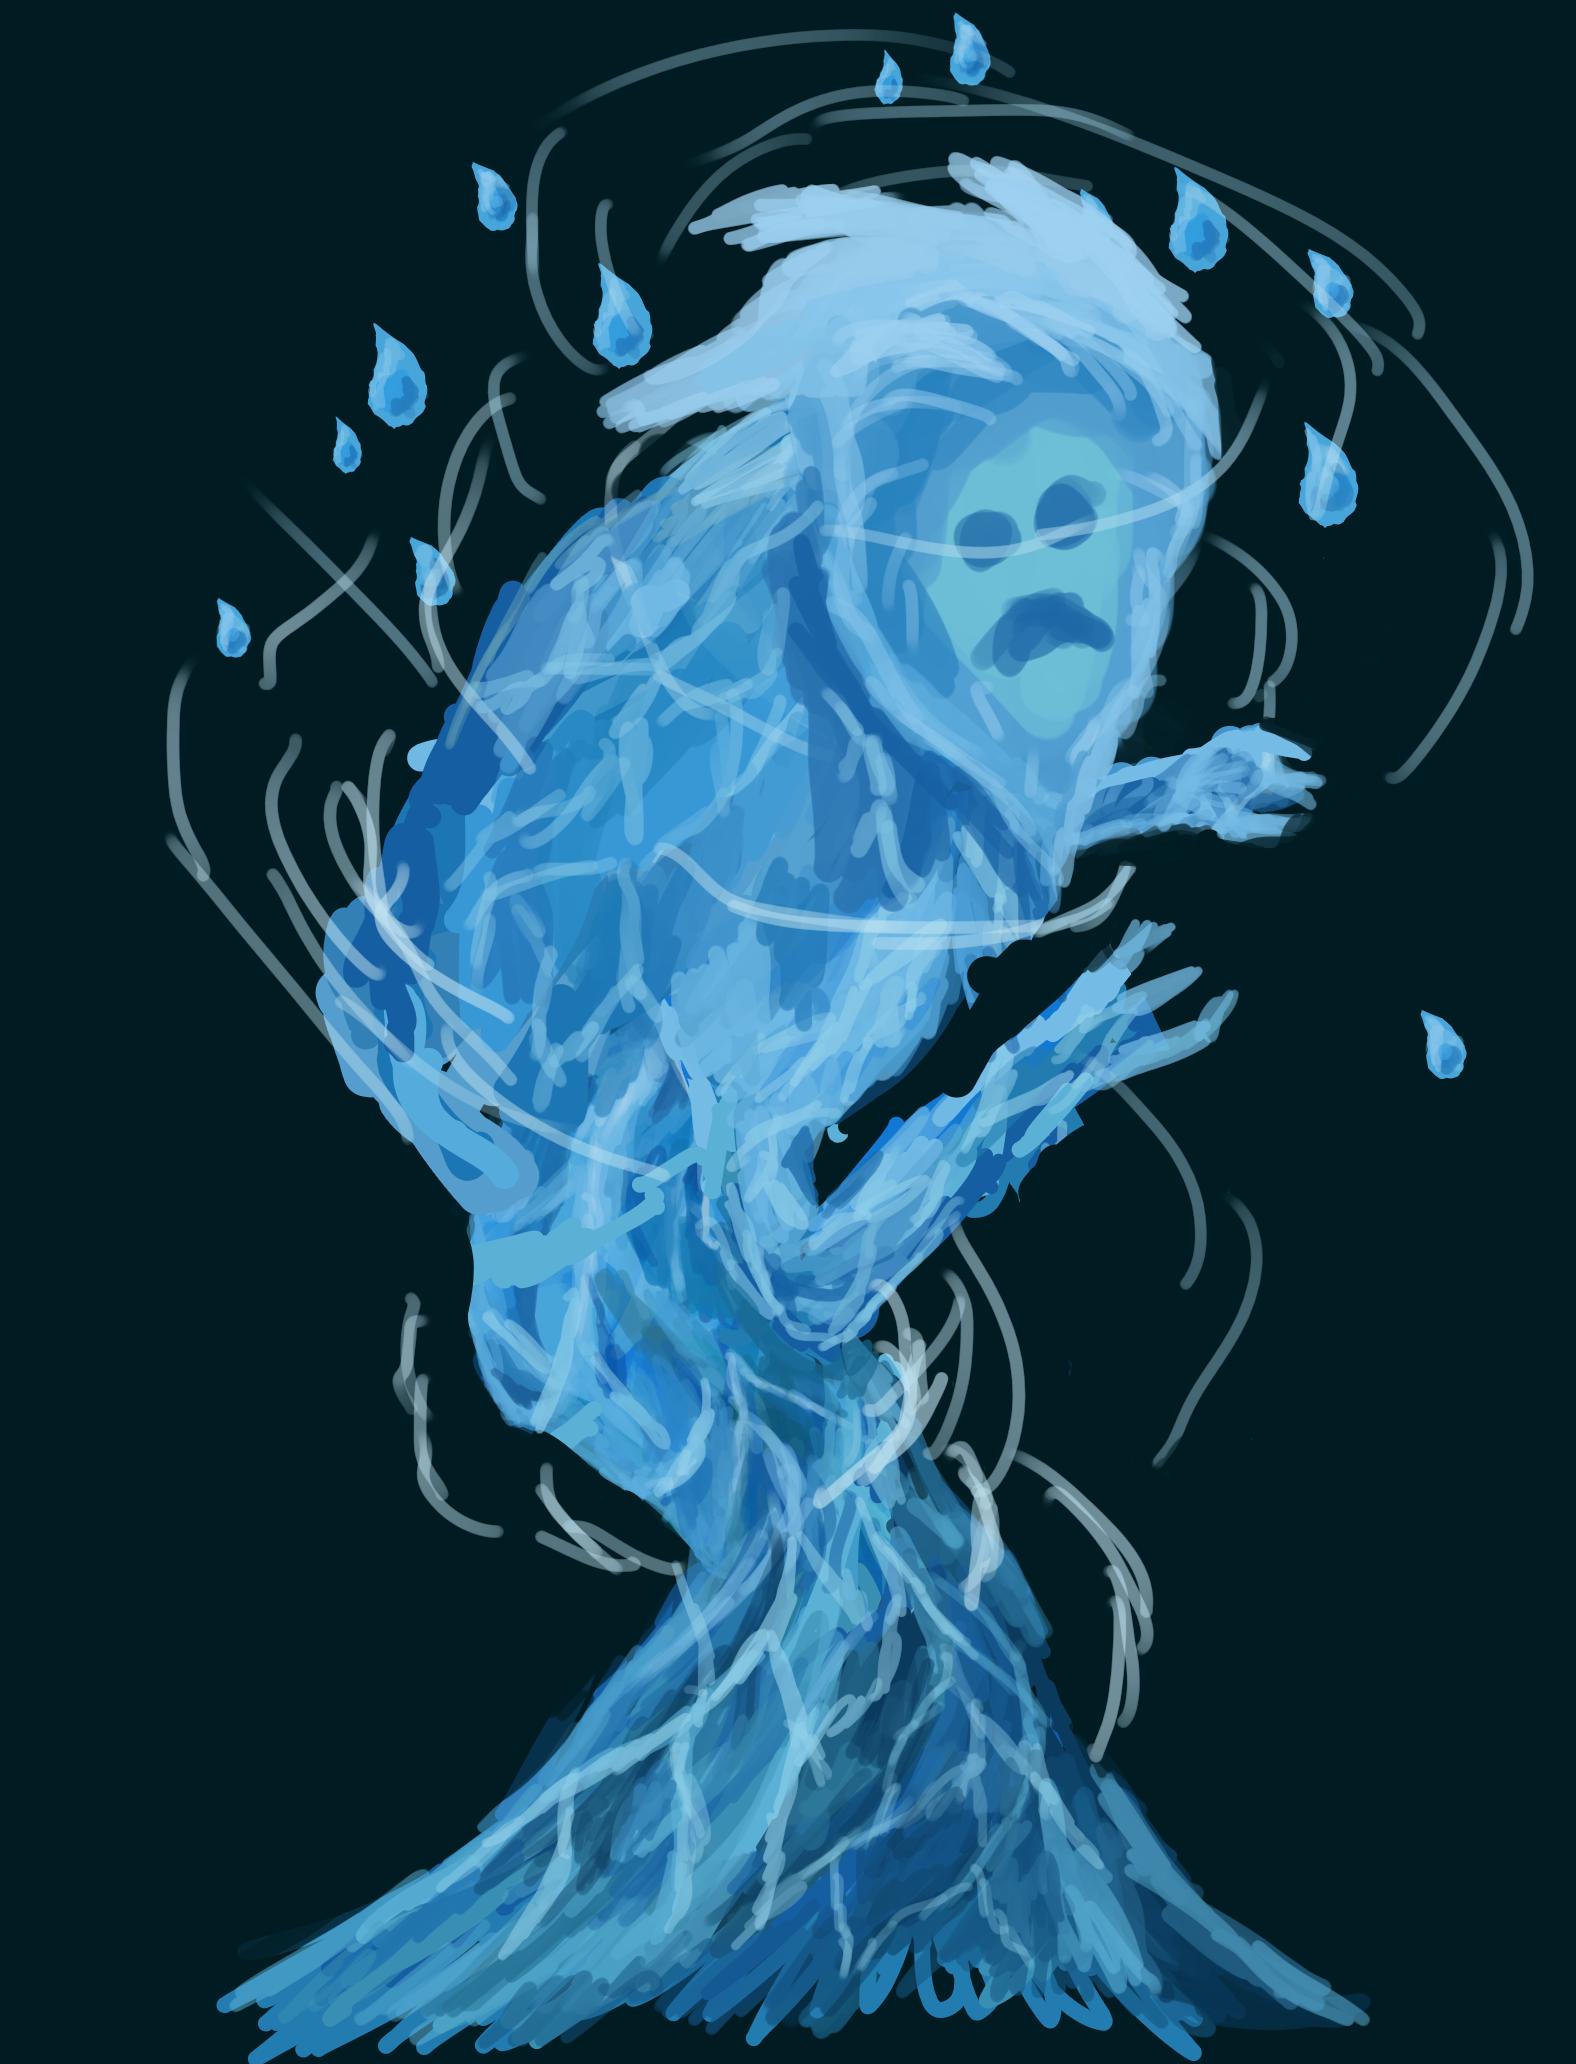 storm_spirit.png